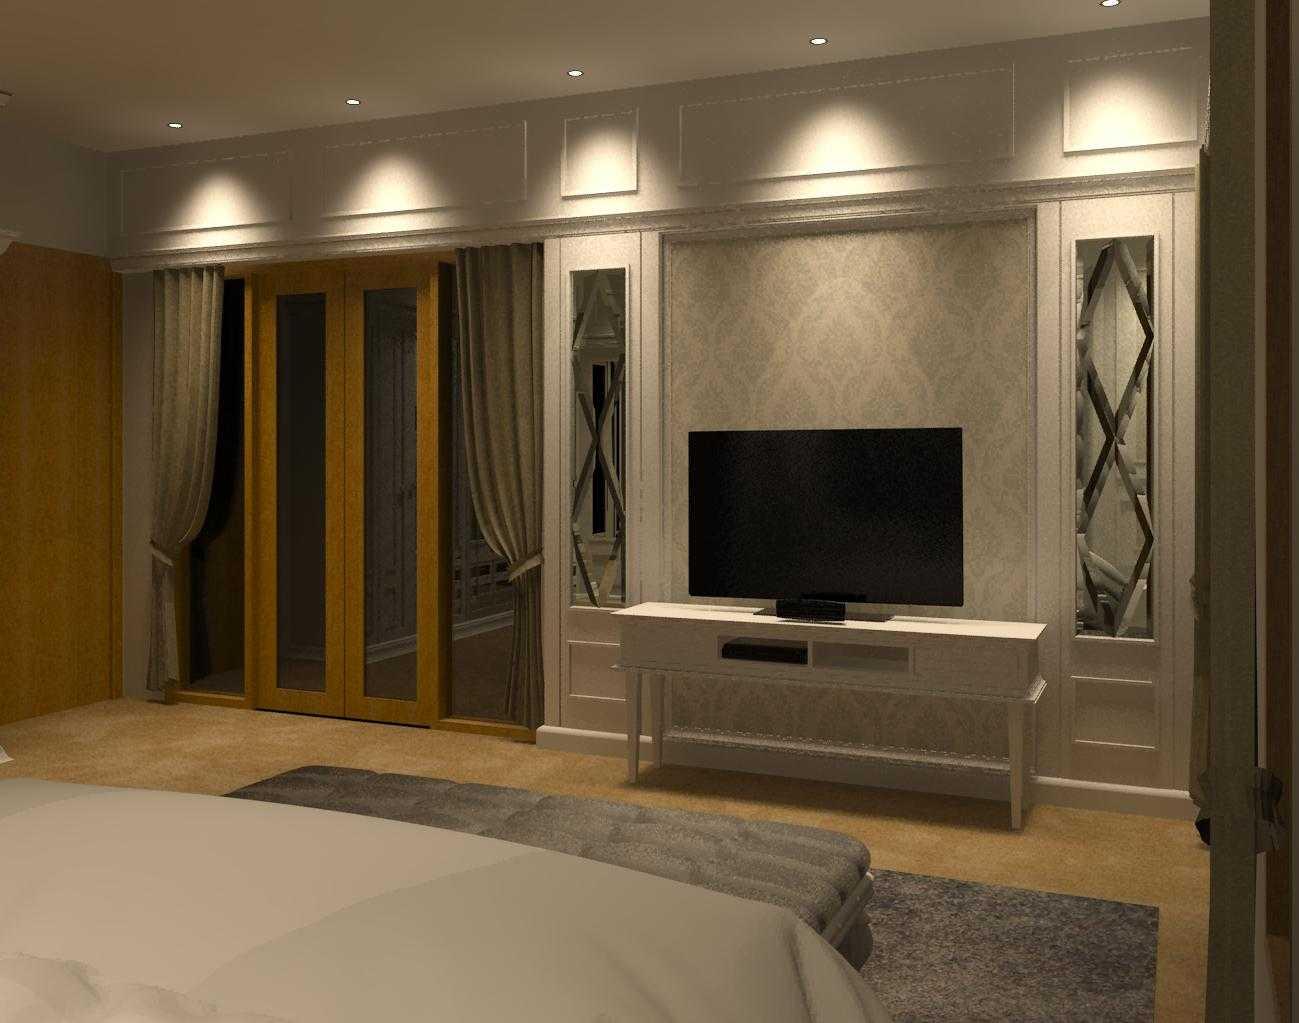 Ananda Ardiansyah Architect Master Bedroom Makassar, Kota Makassar, Sulawesi Selatan, Indonesia Makassar, Kota Makassar, Sulawesi Selatan, Indonesia Master Bedroom   48783